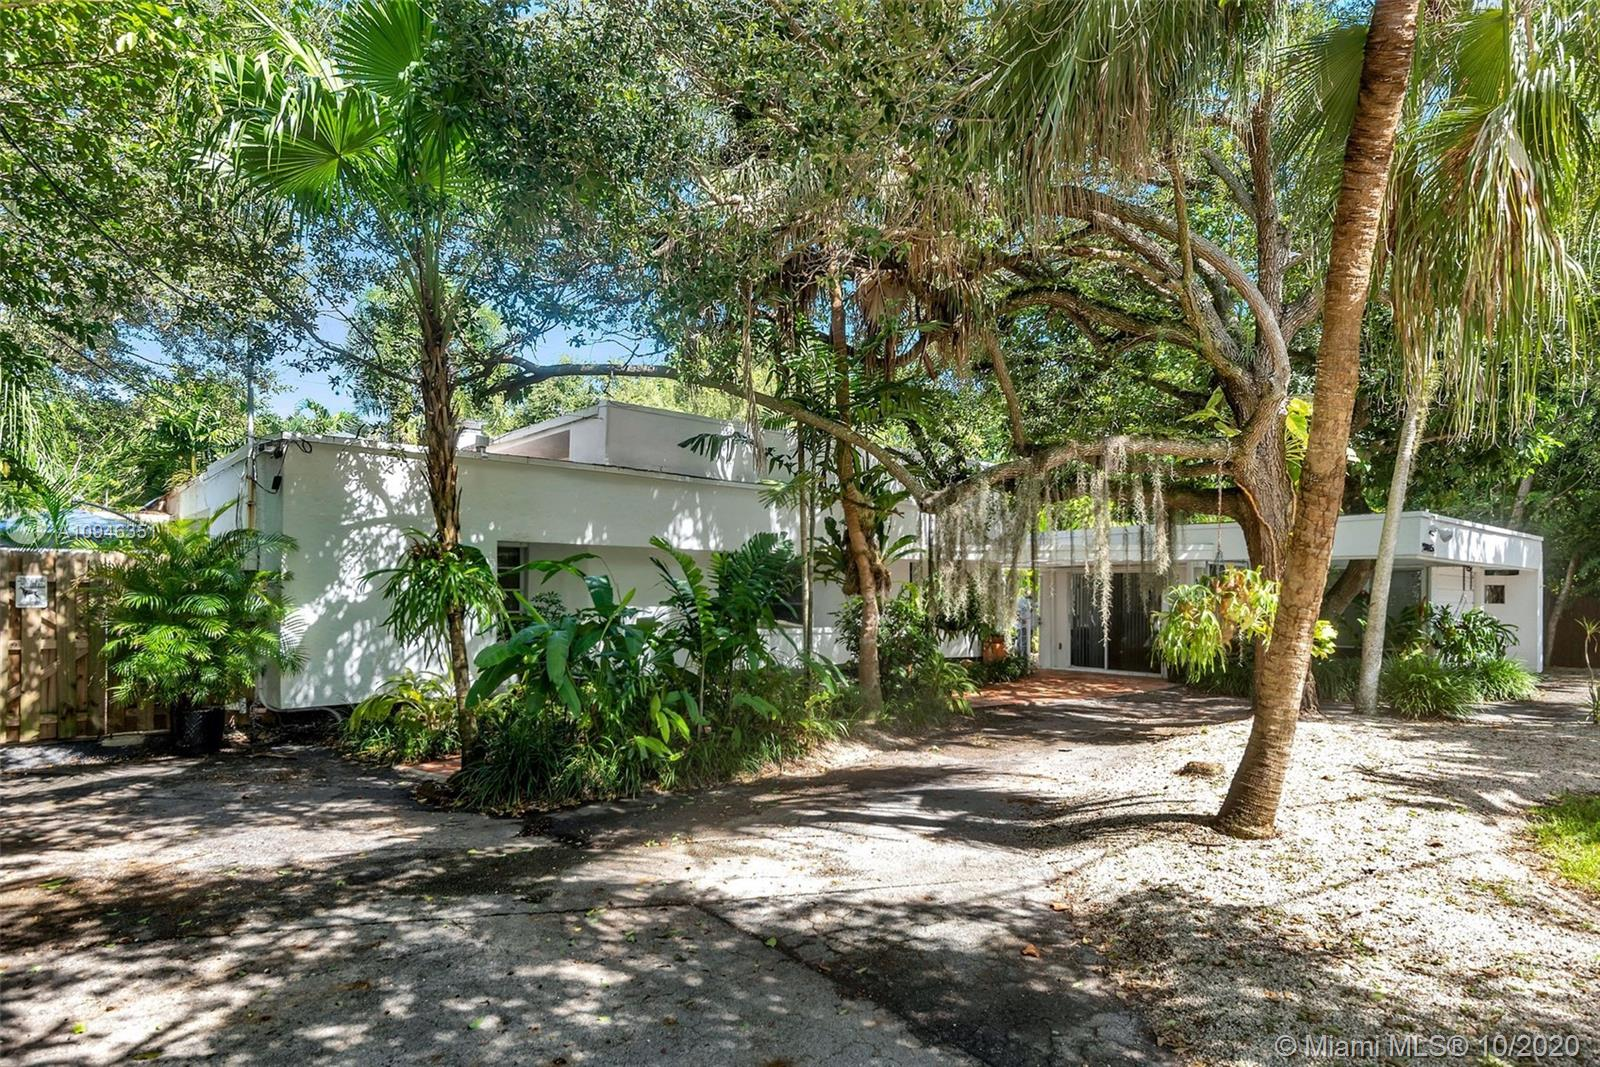 South Miami - 5845 SW 88th St, South Miami, FL 33156